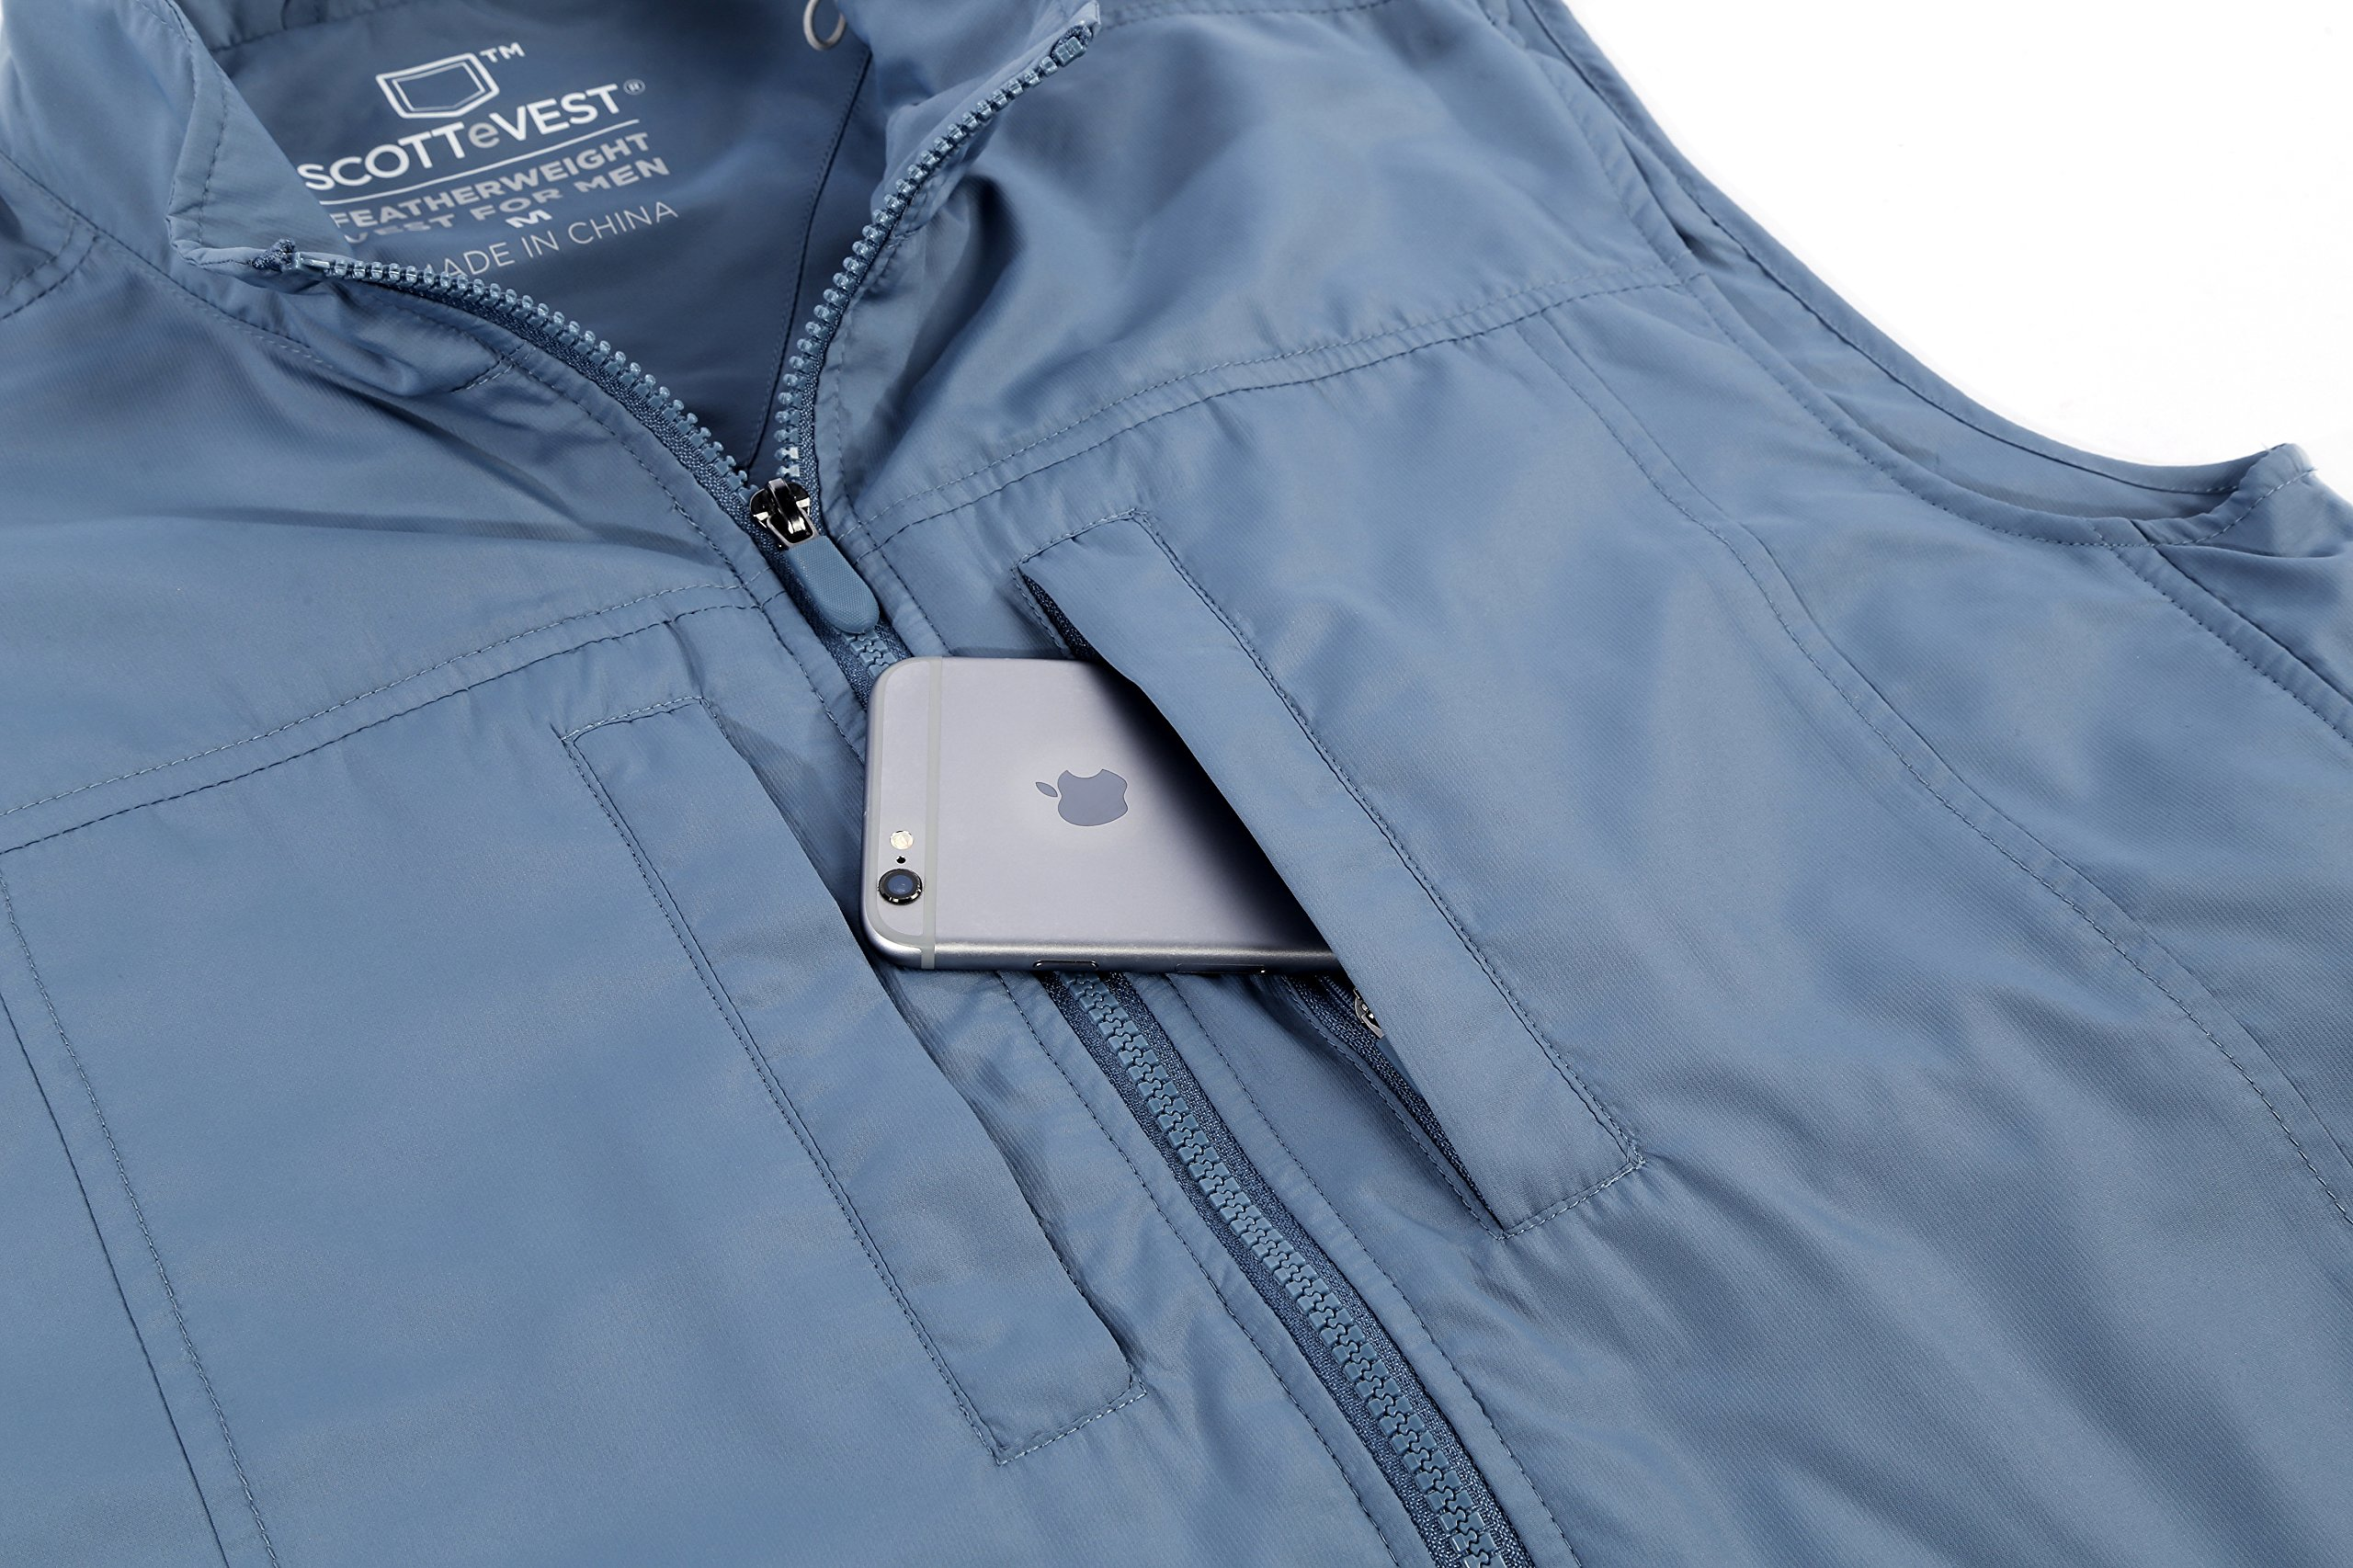 SCOTTeVEST Men's Featherweight Vest - 14 Pockets - Travel Clothing CMT L by SCOTTeVEST (Image #5)